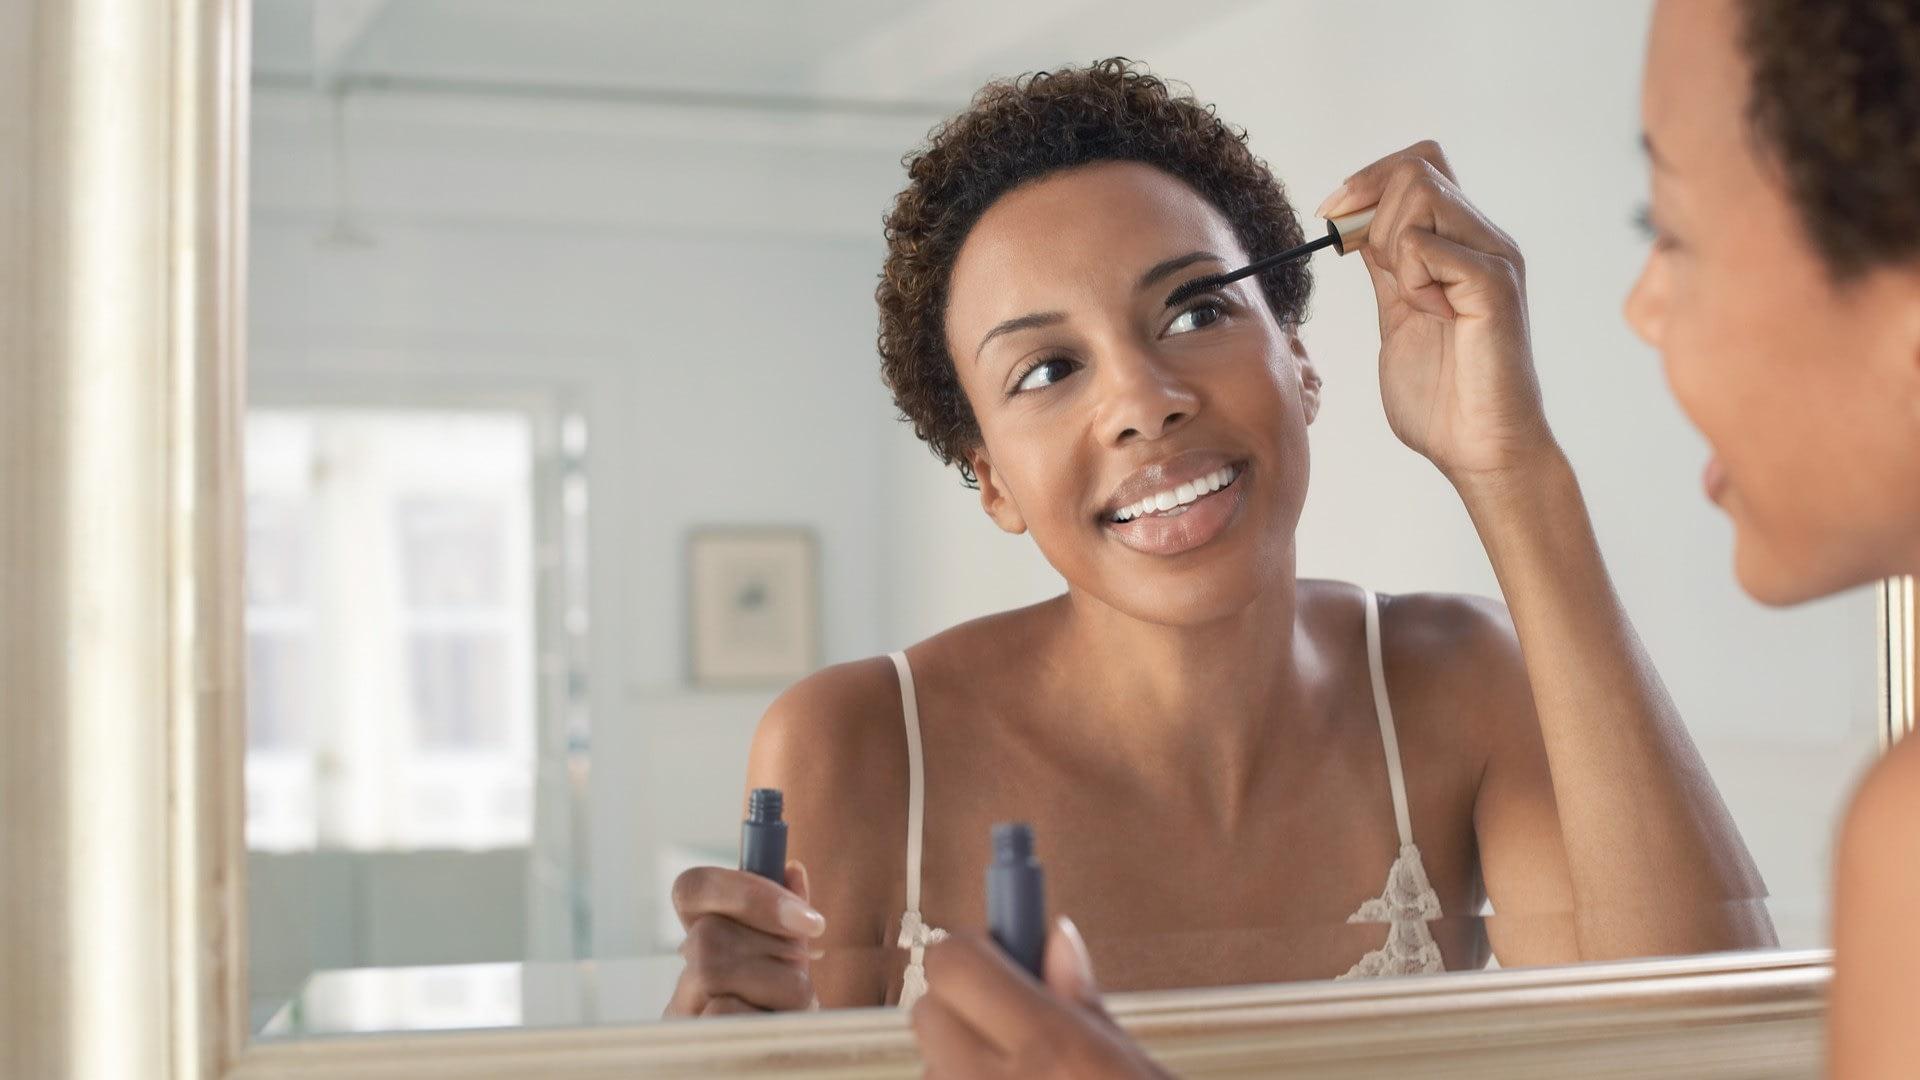 woman applying mascara in mirror using makeup tips